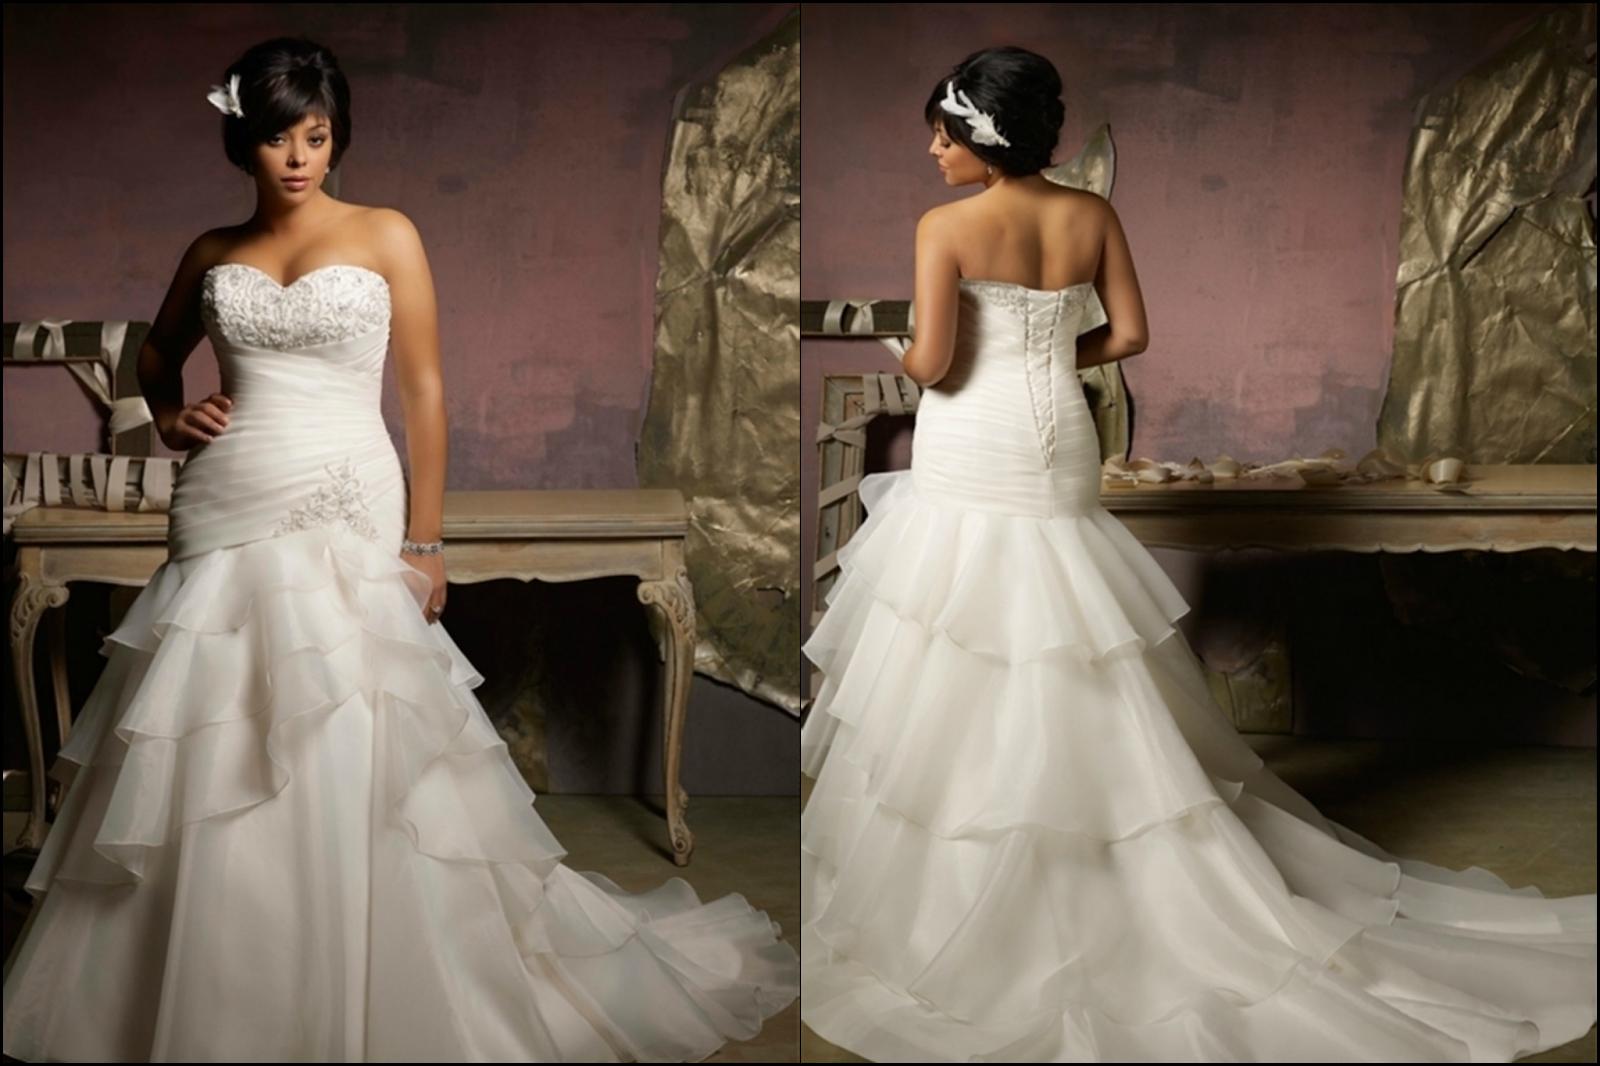 Big Girl Wedding Dress 32 Epic  Things to Remember